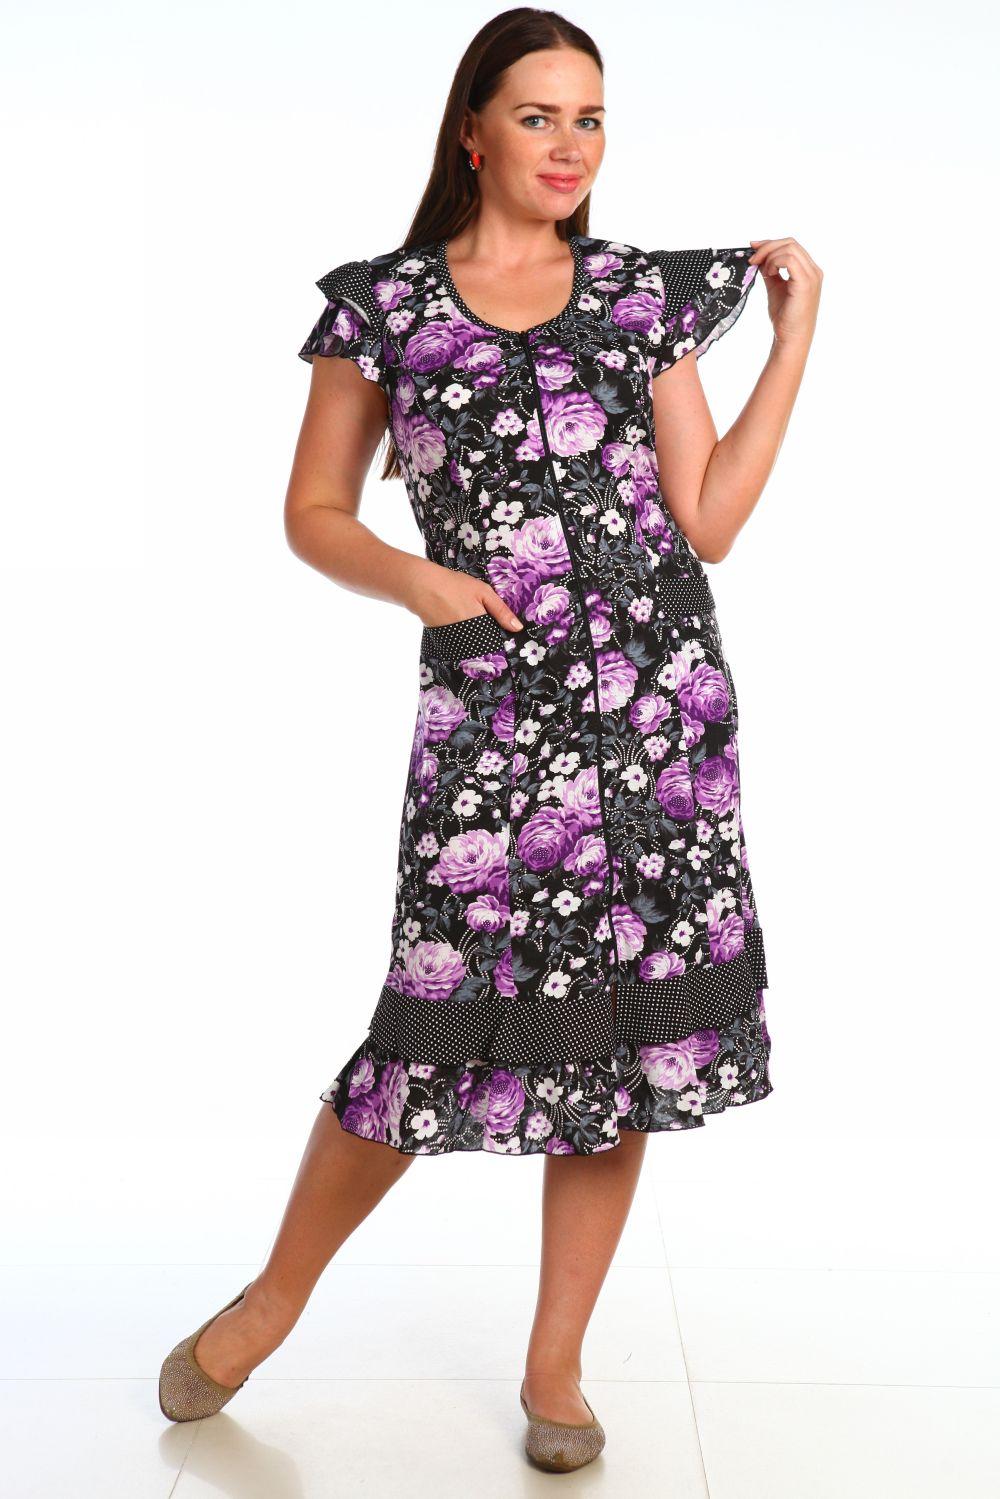 Халат женский Стрекоза без рукаваДомашняя одежда<br><br><br>Размер: 54